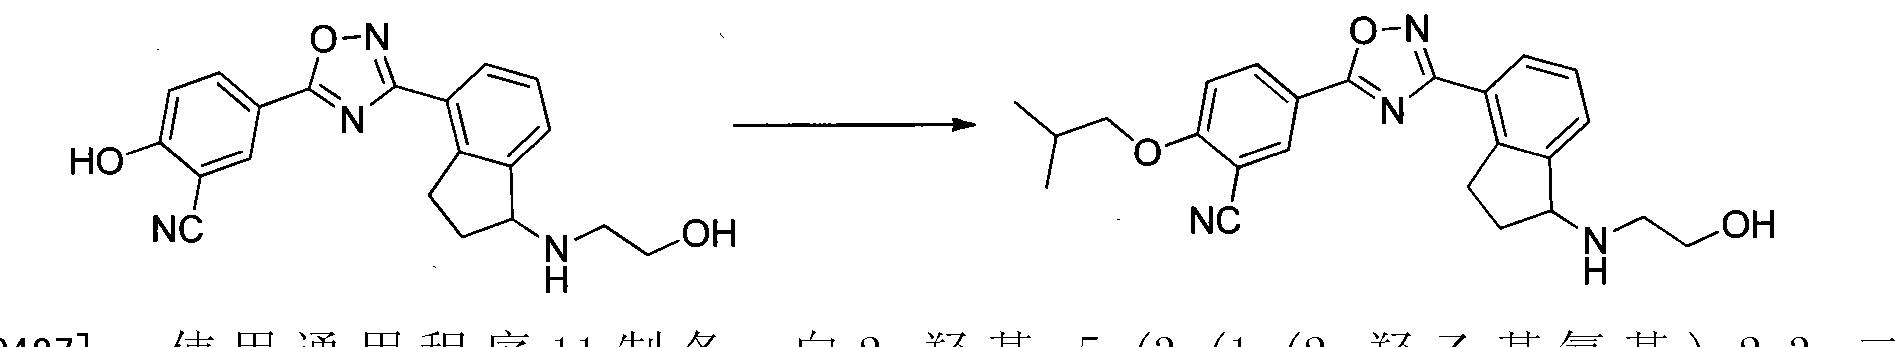 cn102762100b selective sphingosine 1 phosphate receptor modulators